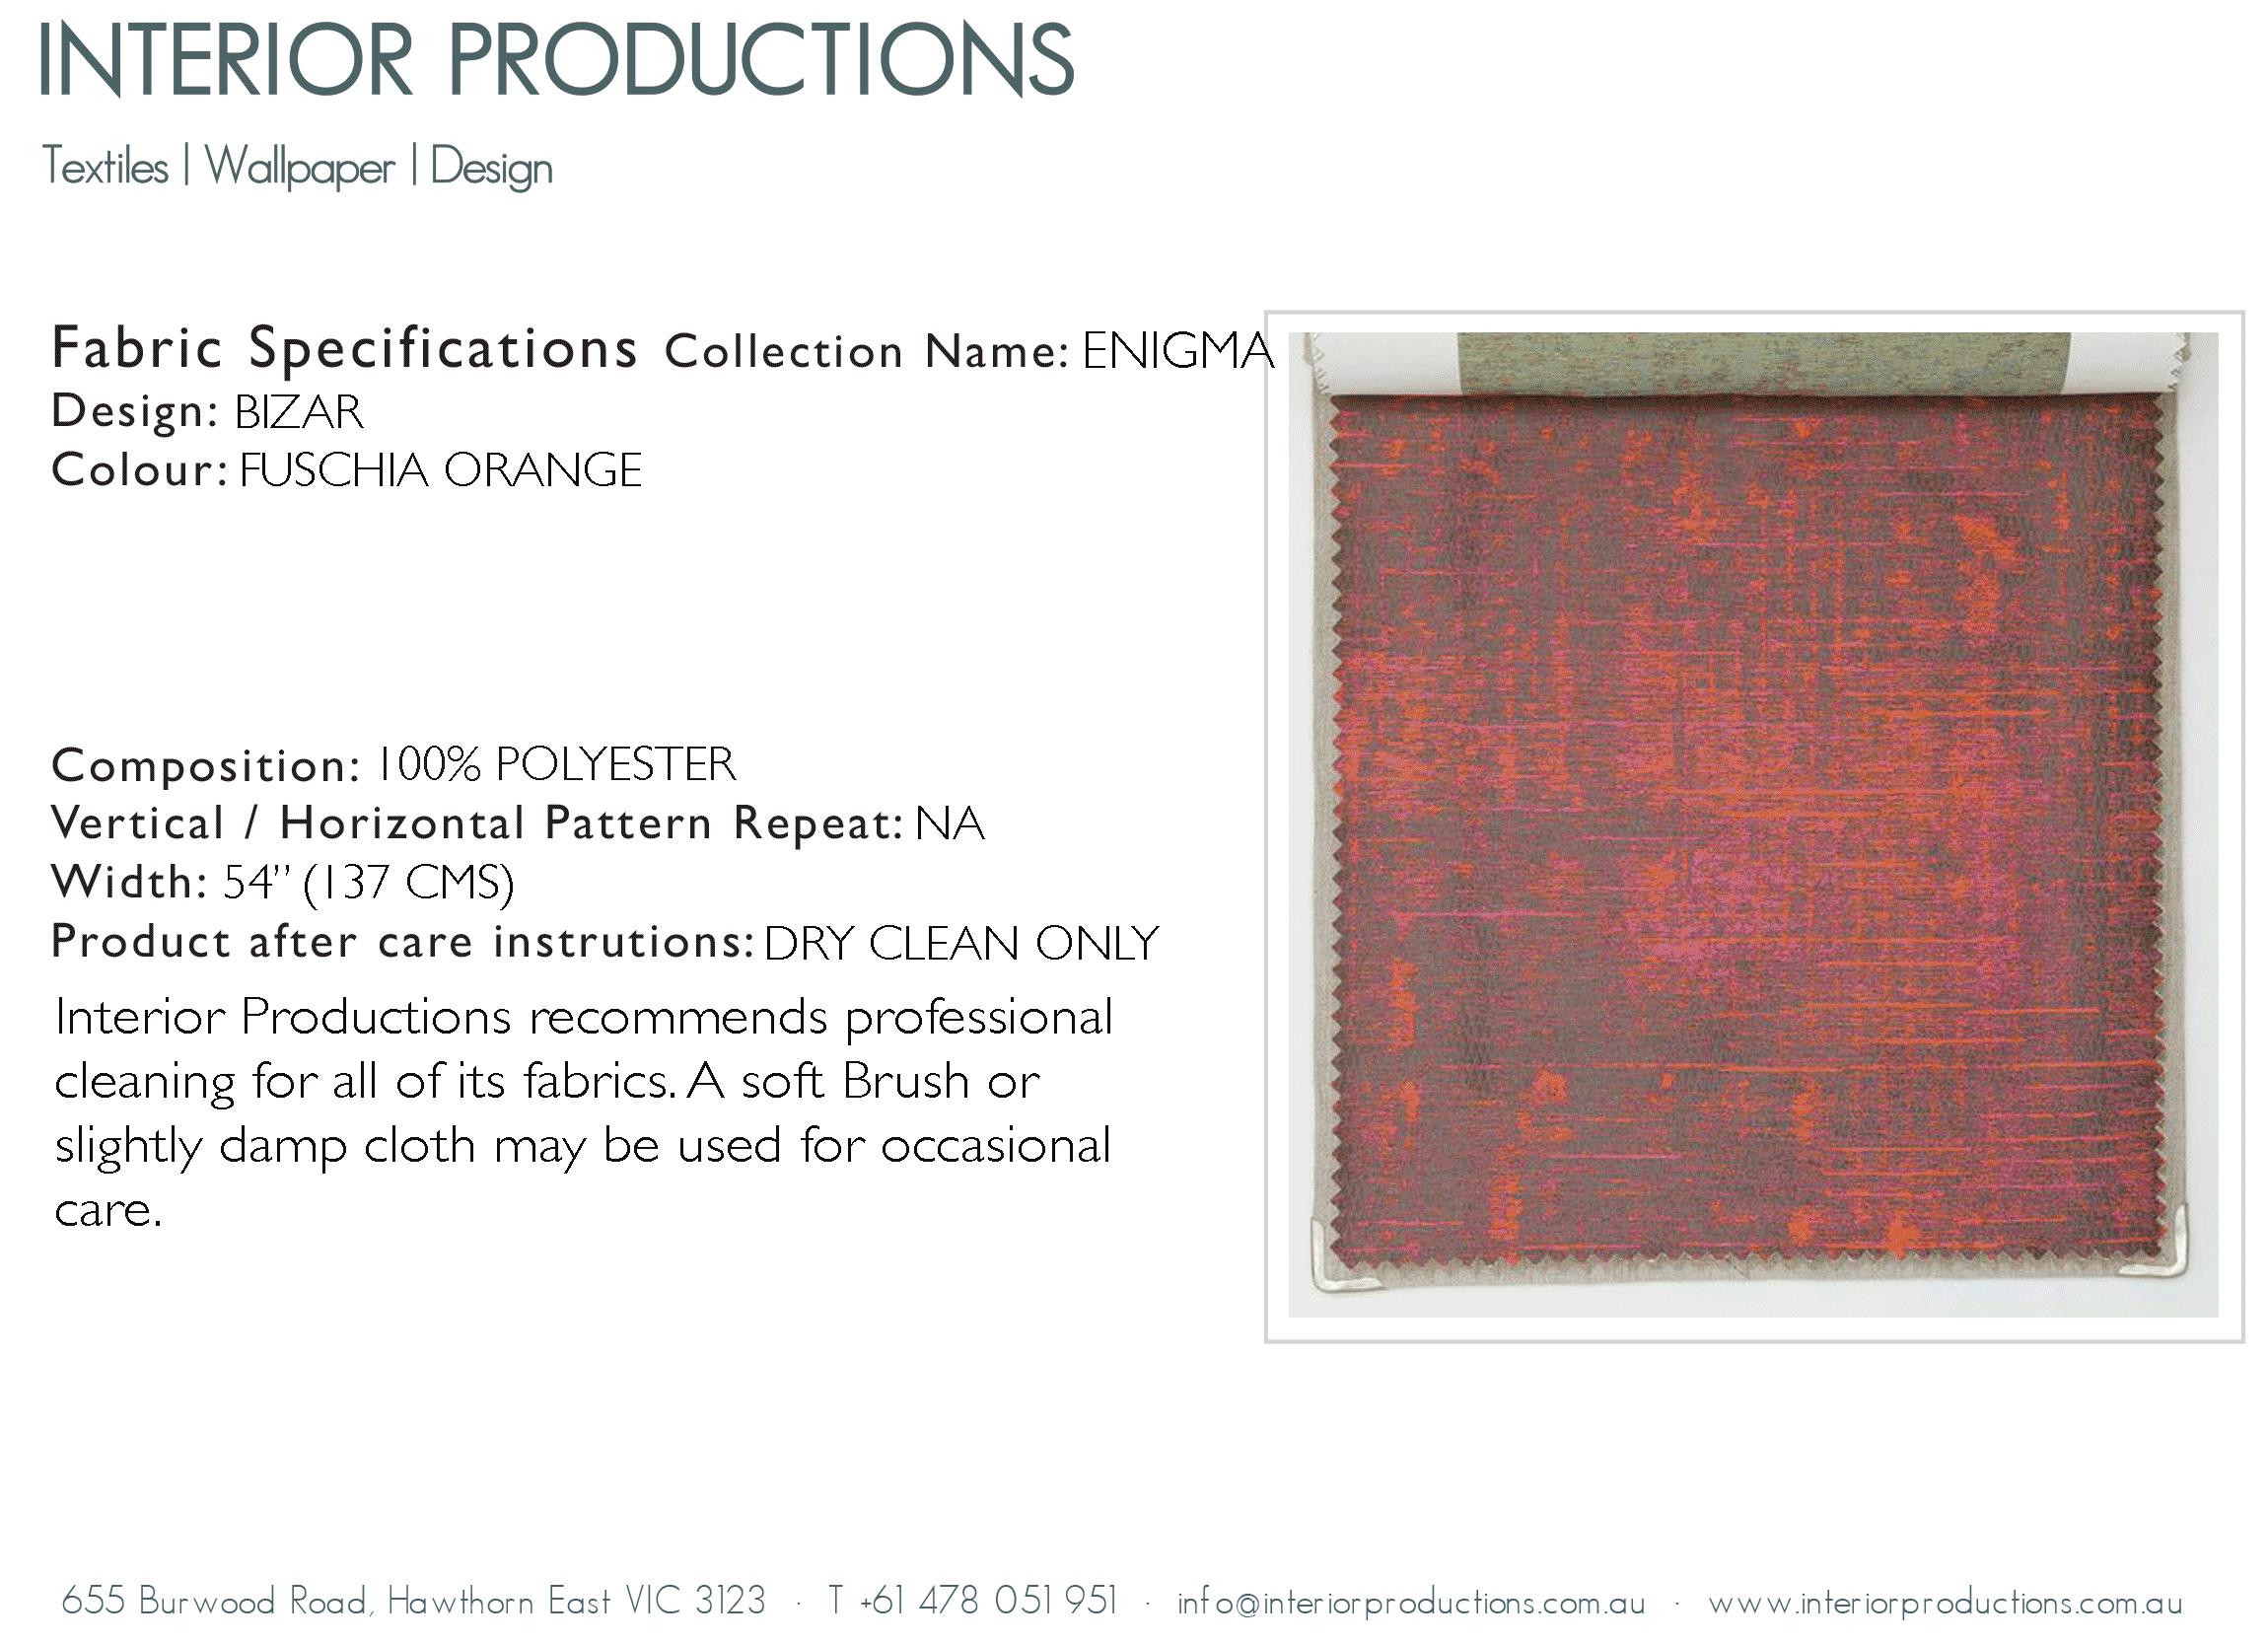 interior_productions_BIZAR---FUSCHIA-ORANGE